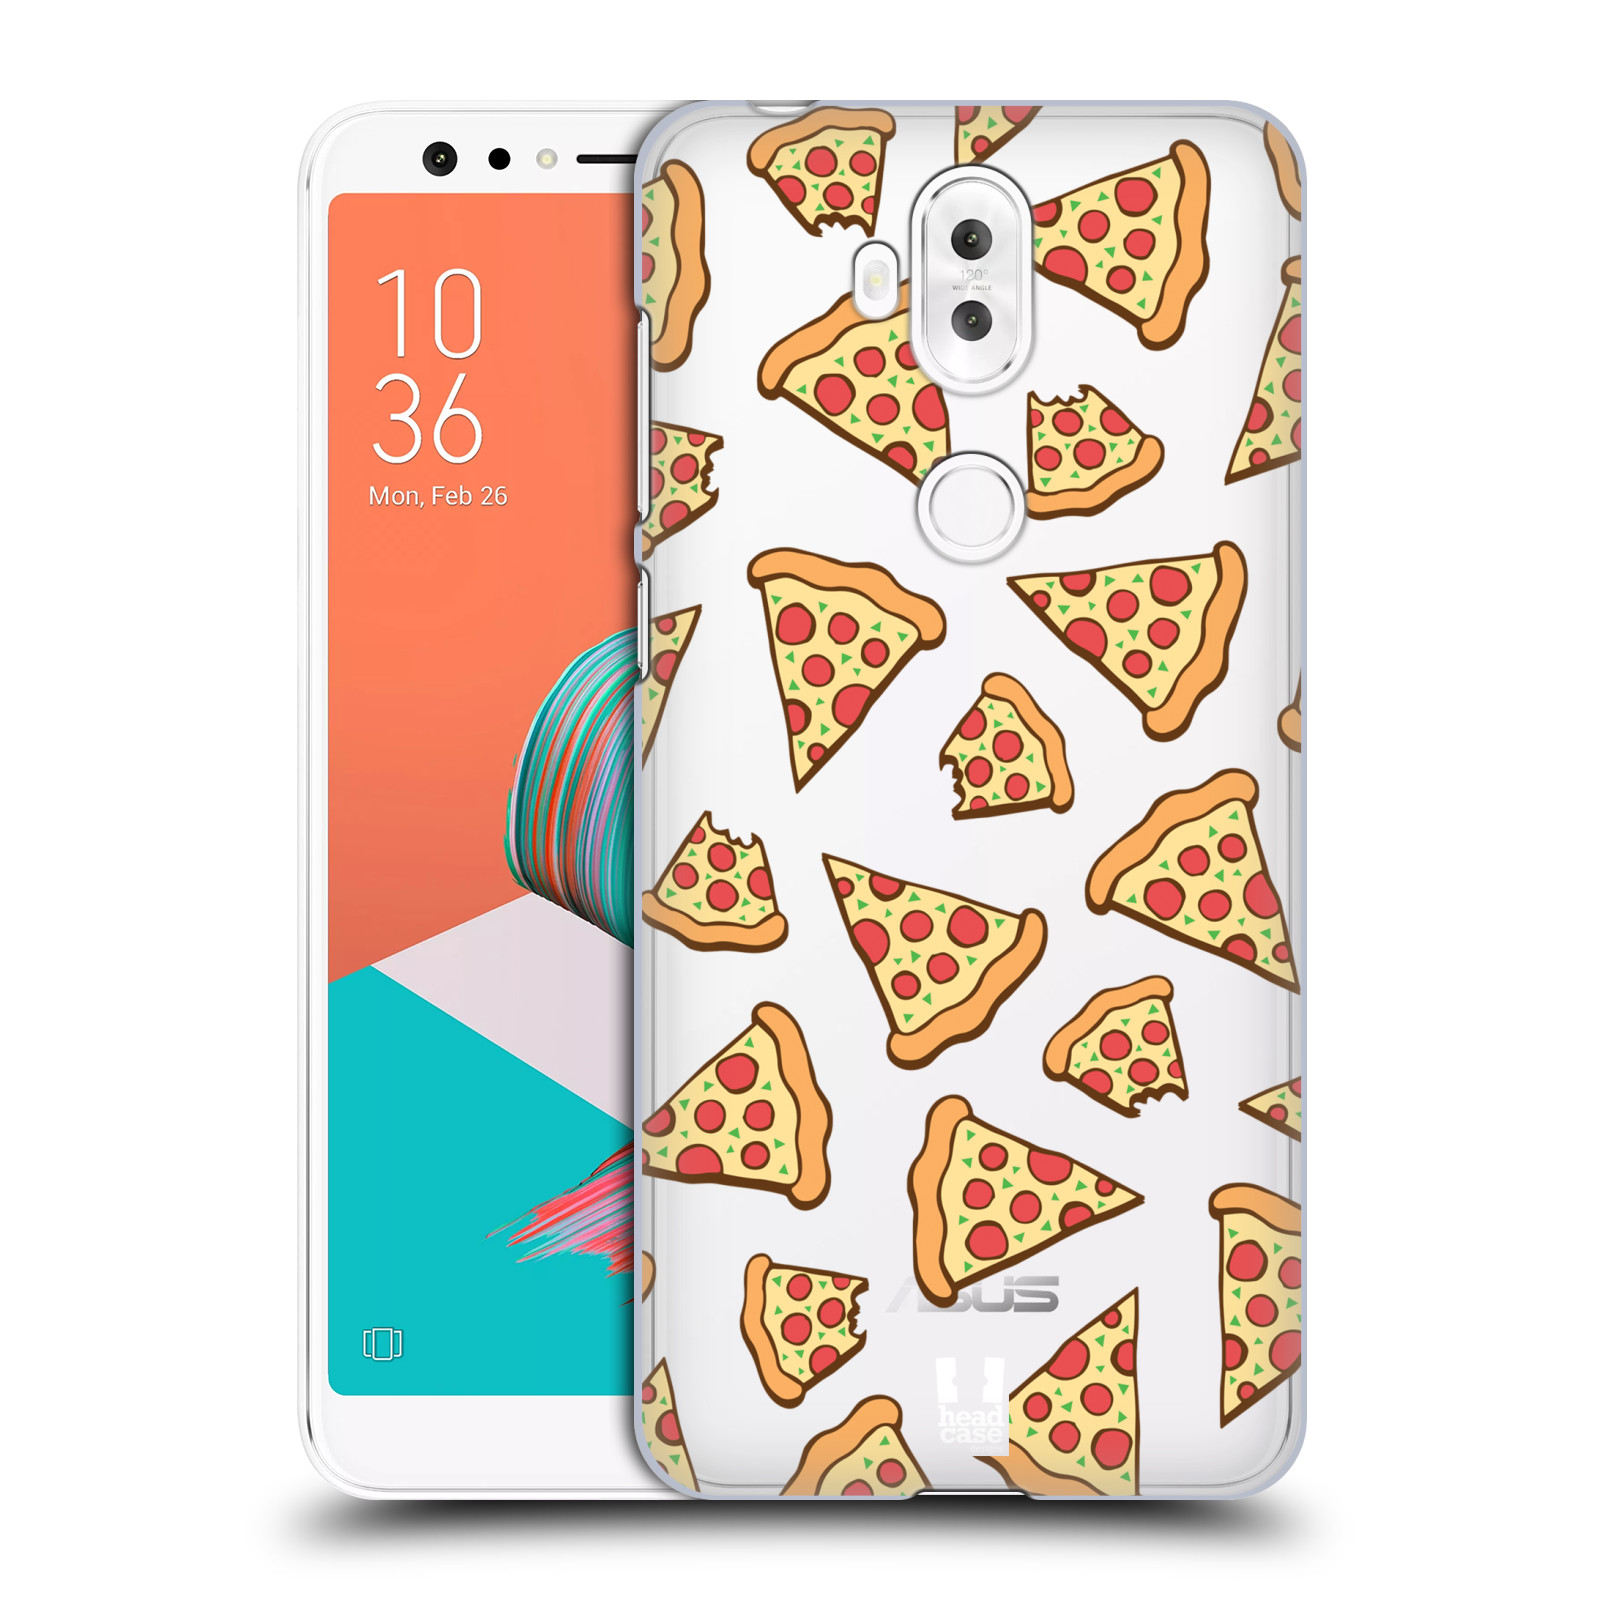 Plastové pouzdro na mobil Asus ZenFone 5 Lite ZC600KL - Head Case - Pizza (Plastový kryt či obal na mobilní telefon Asus ZenFone 5 Lite (ZC600KL) s motivem Pizza)